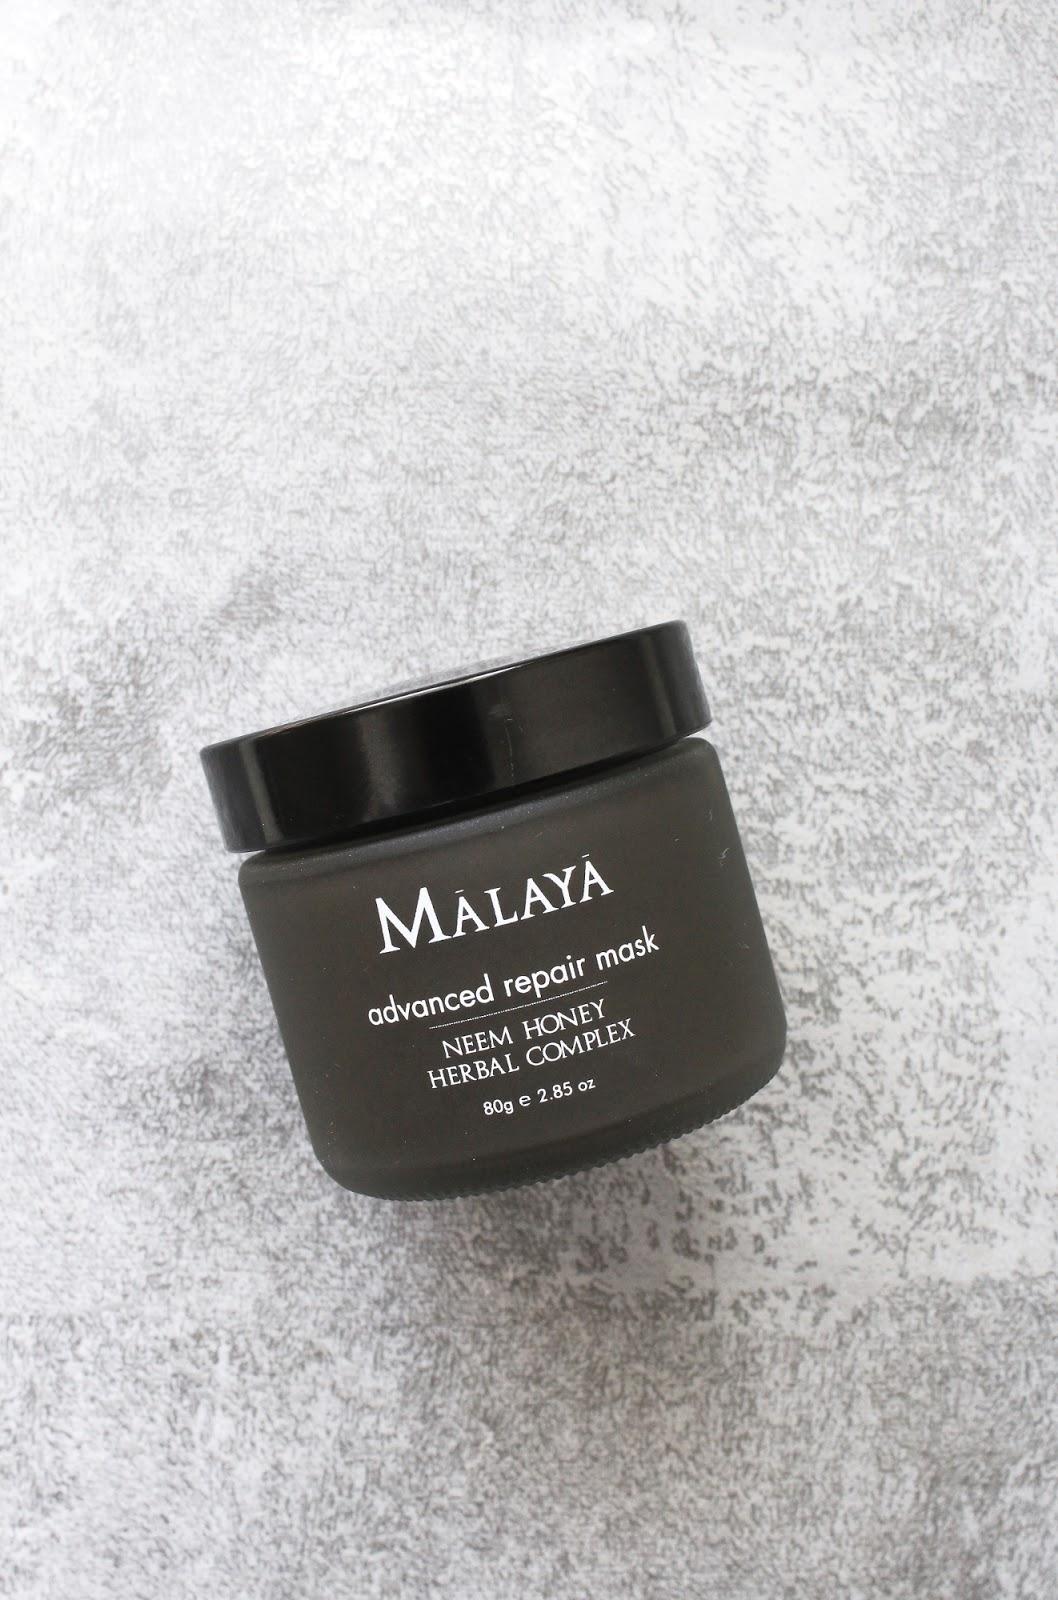 Malaya Organics Advanced Repair Mask Neem Honey Herbal Complex April Boxwalla Beauty Box